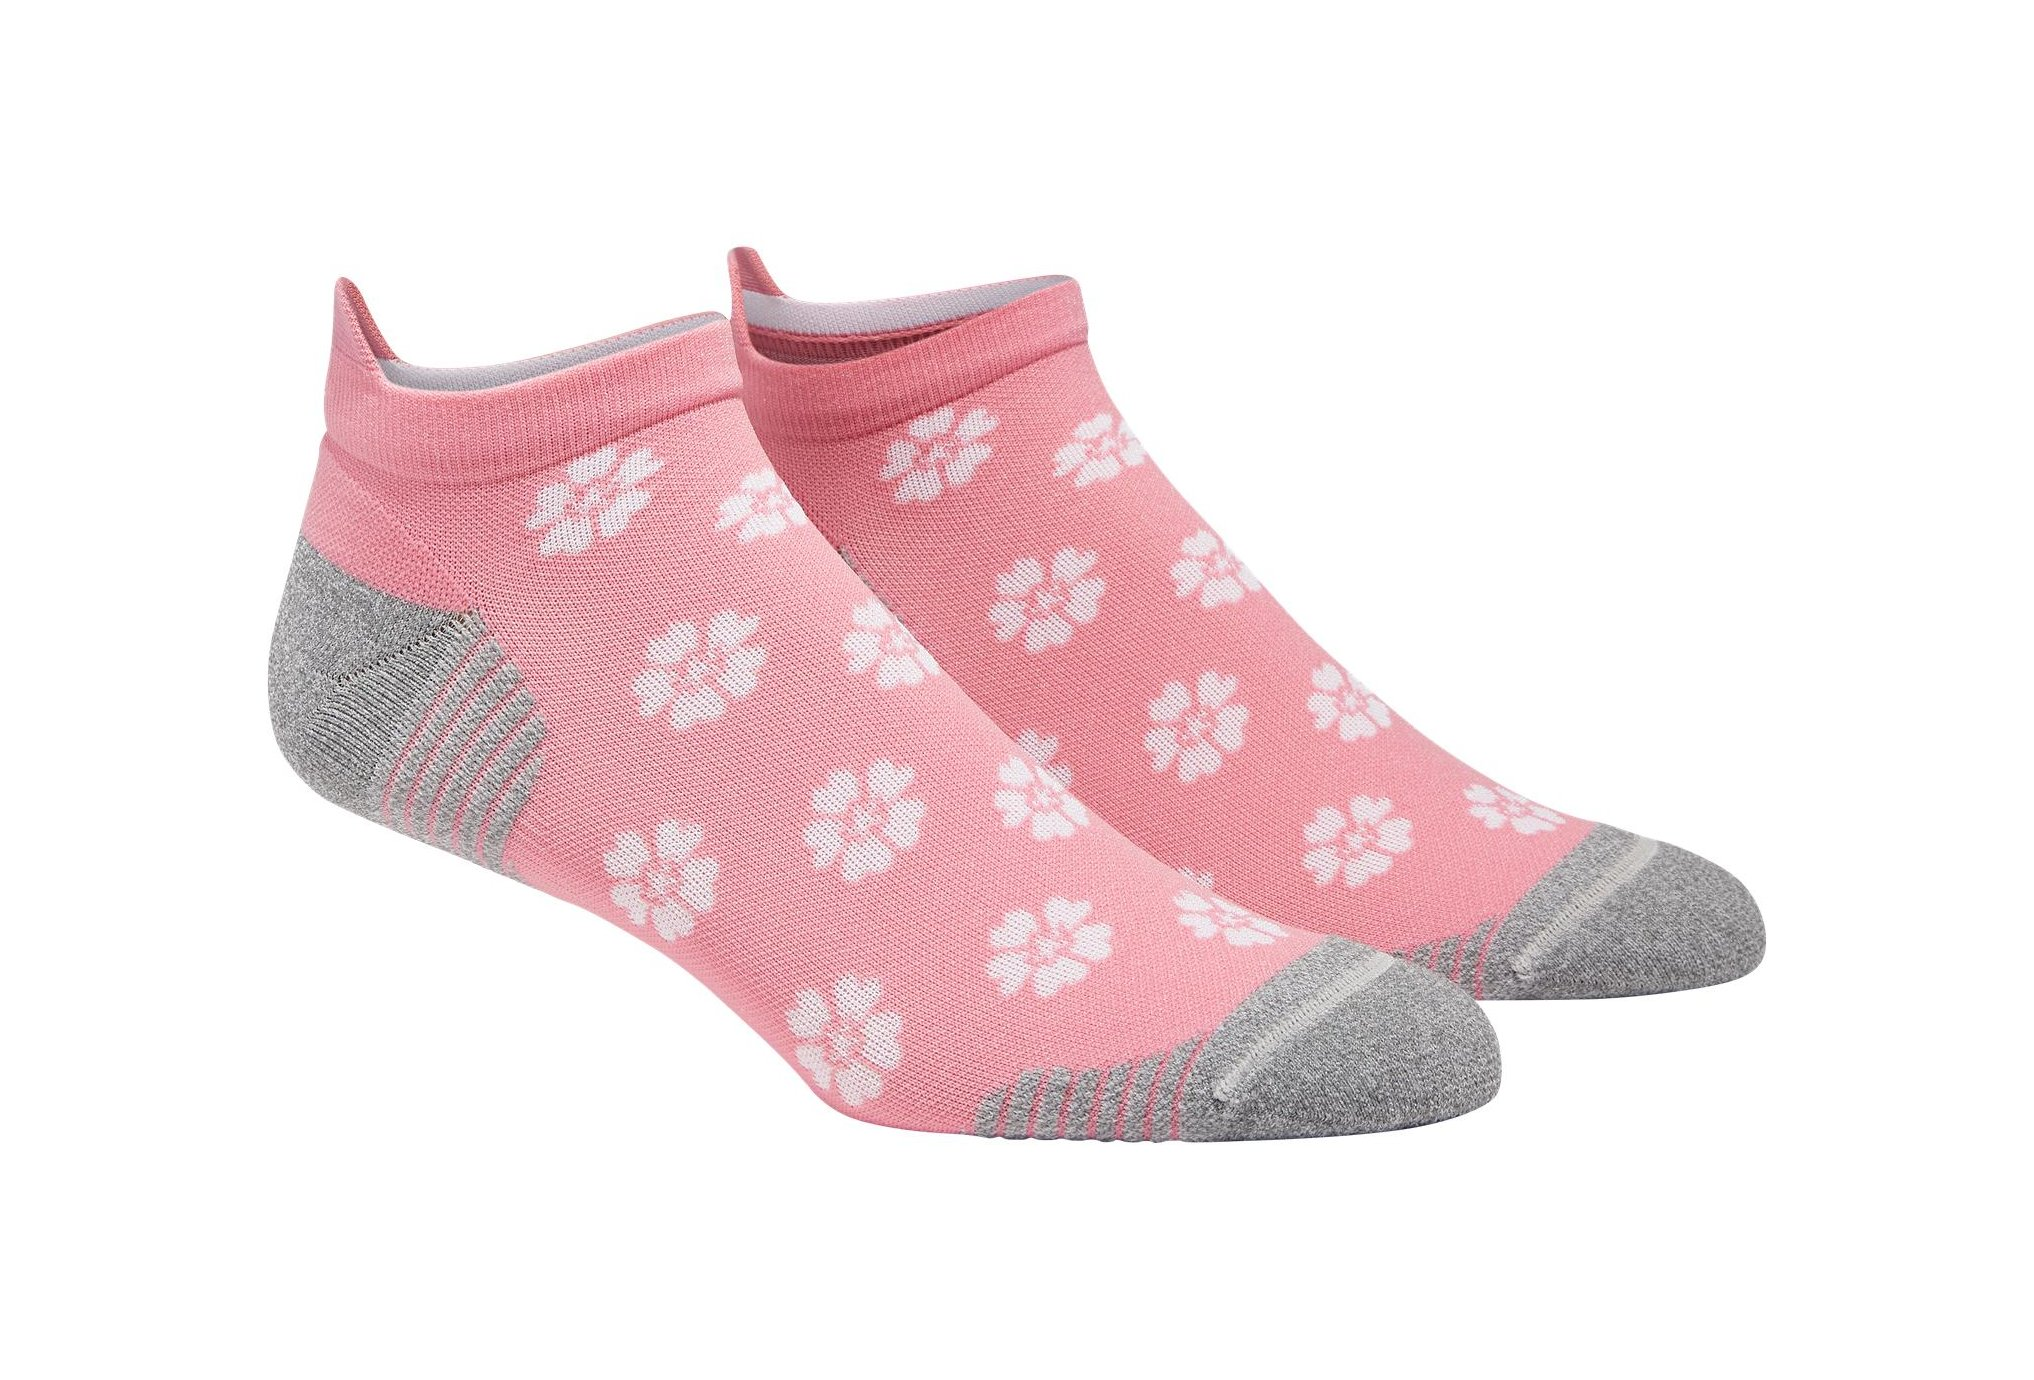 Asics Sakura Ankle Chaussettes